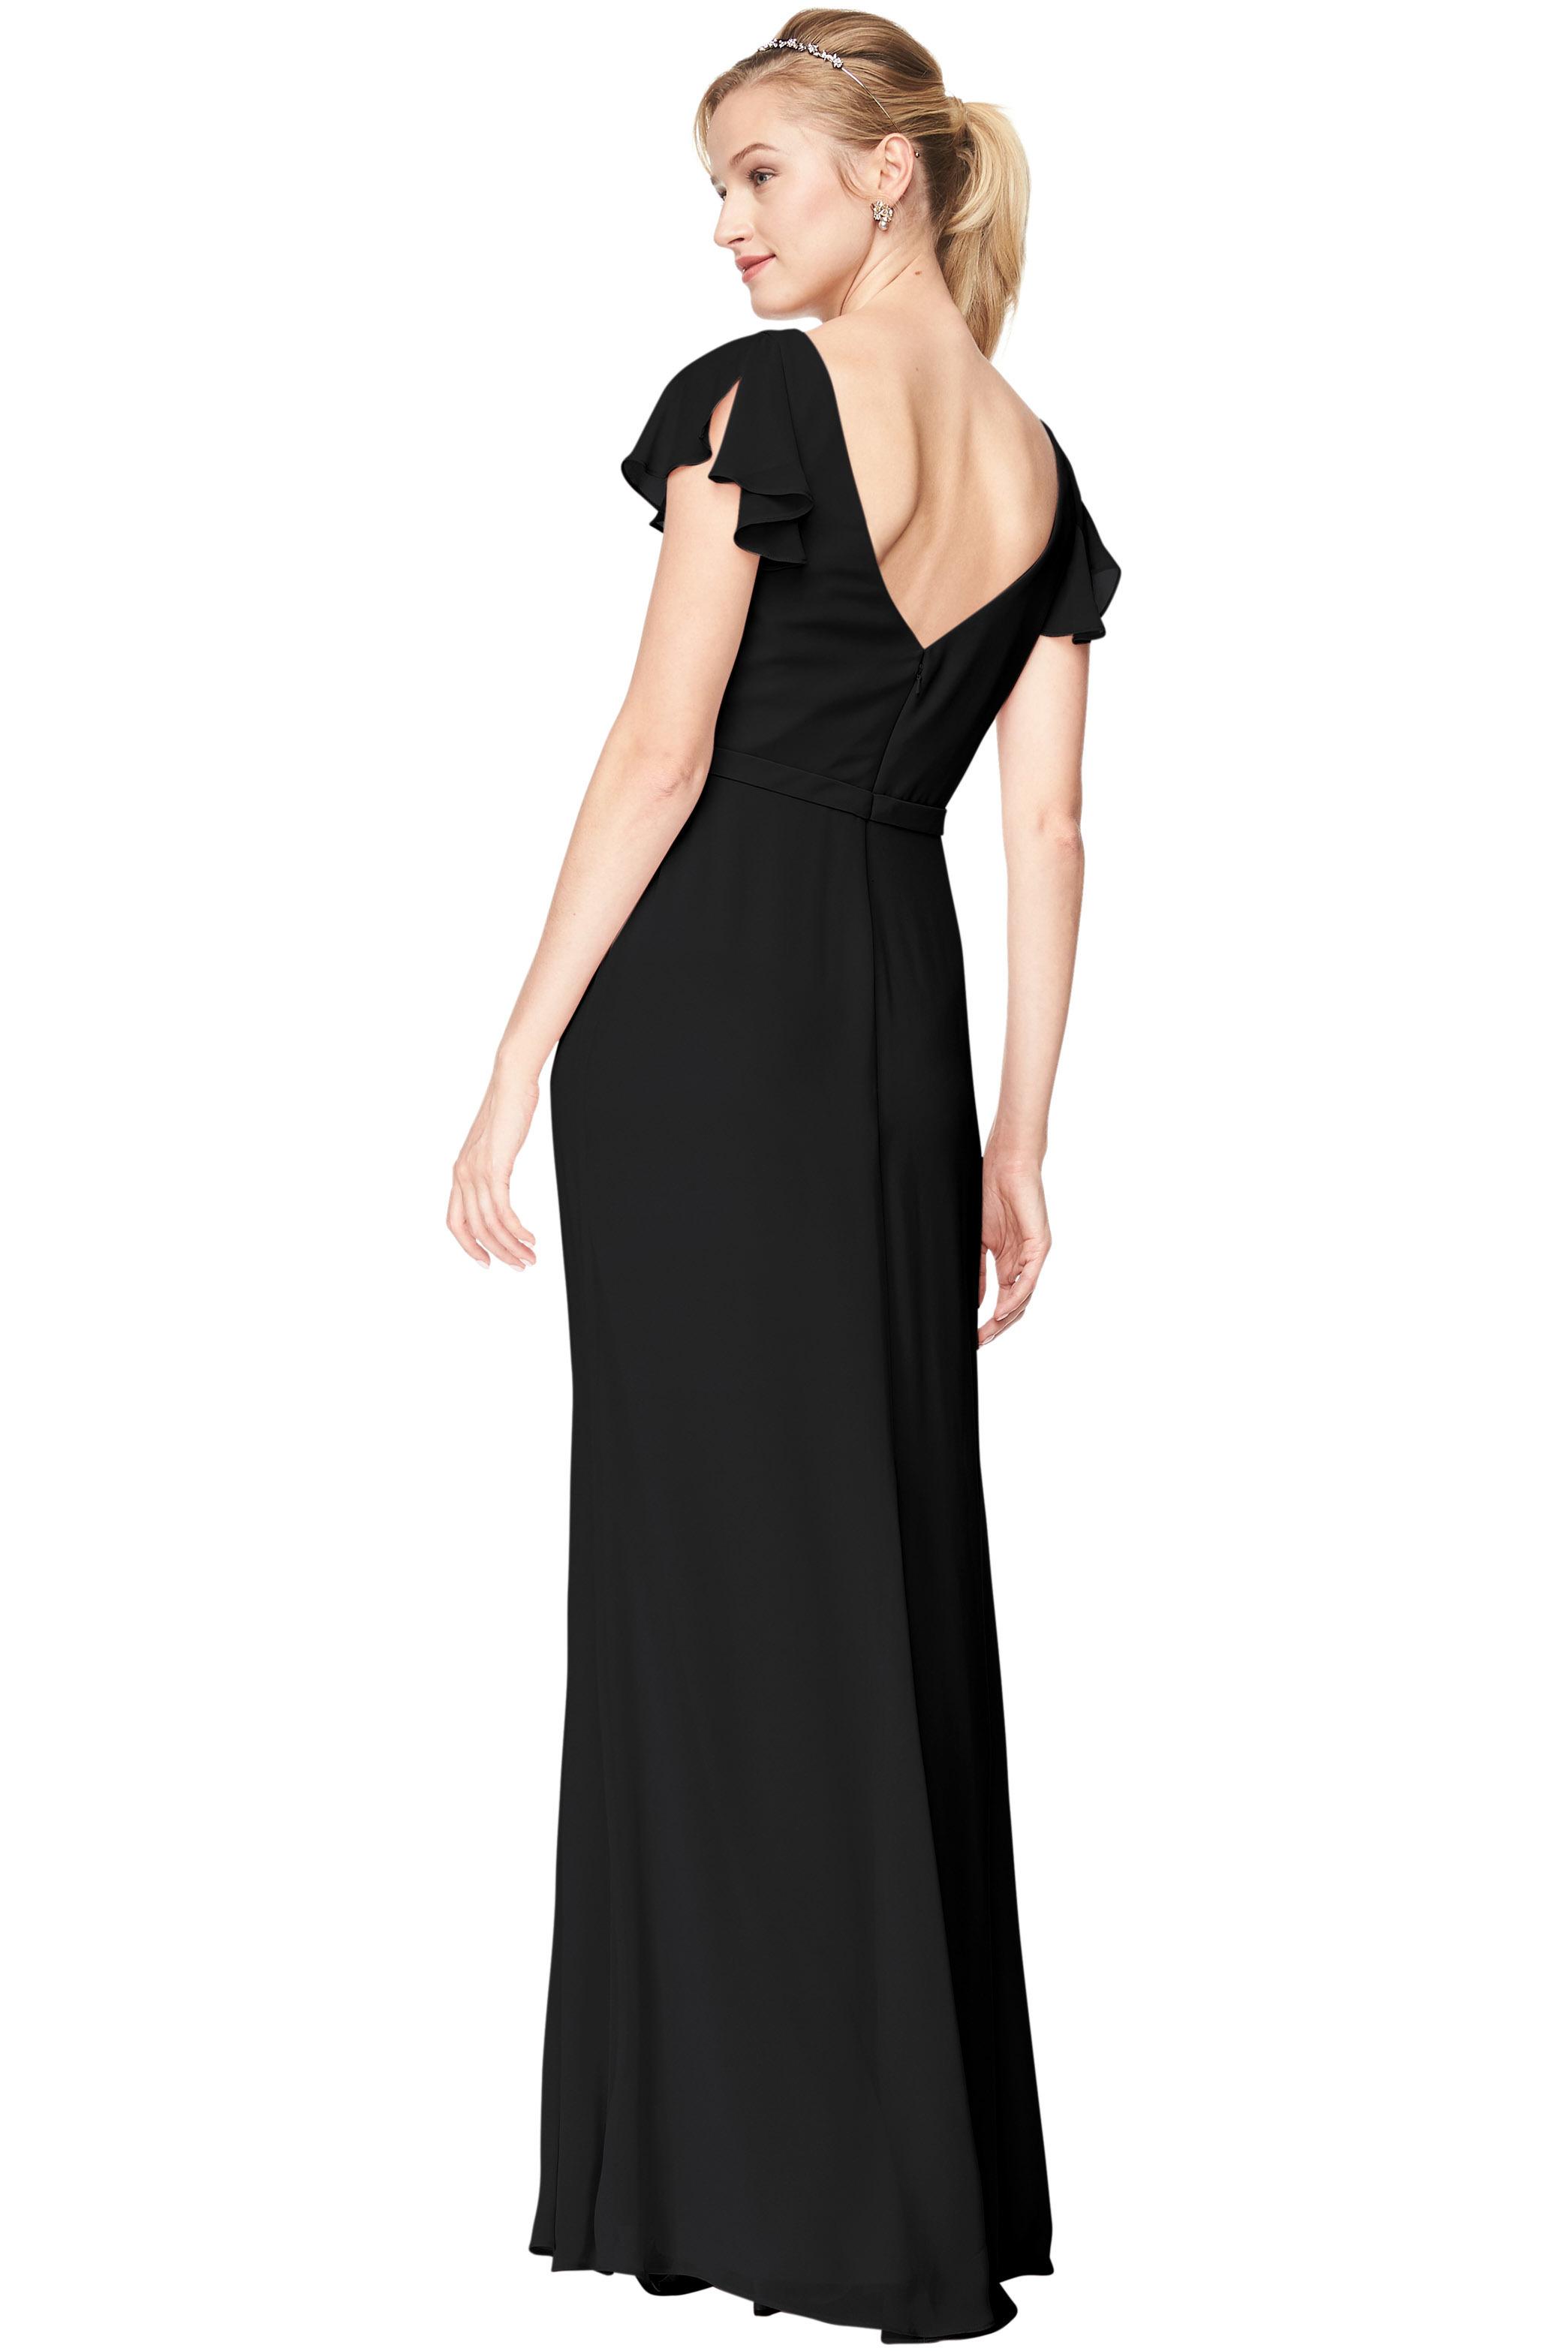 Bill Levkoff BLACK Chiffon V-Neck, Cap Sleeve A-Line gown, $184.00 Back